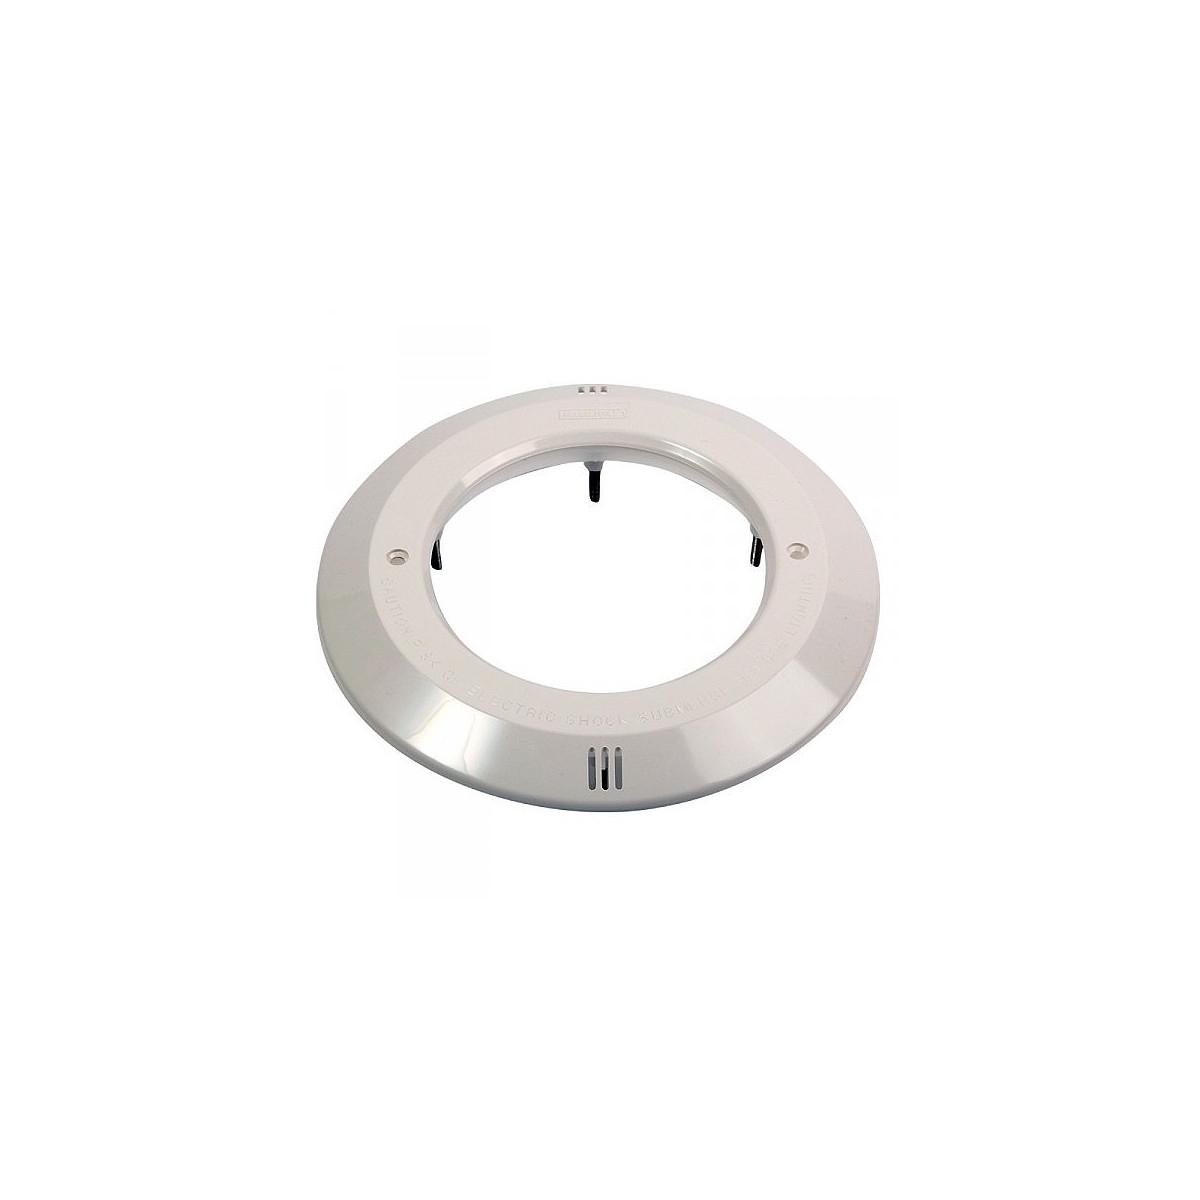 Aro blanco foco proyector AstralPool